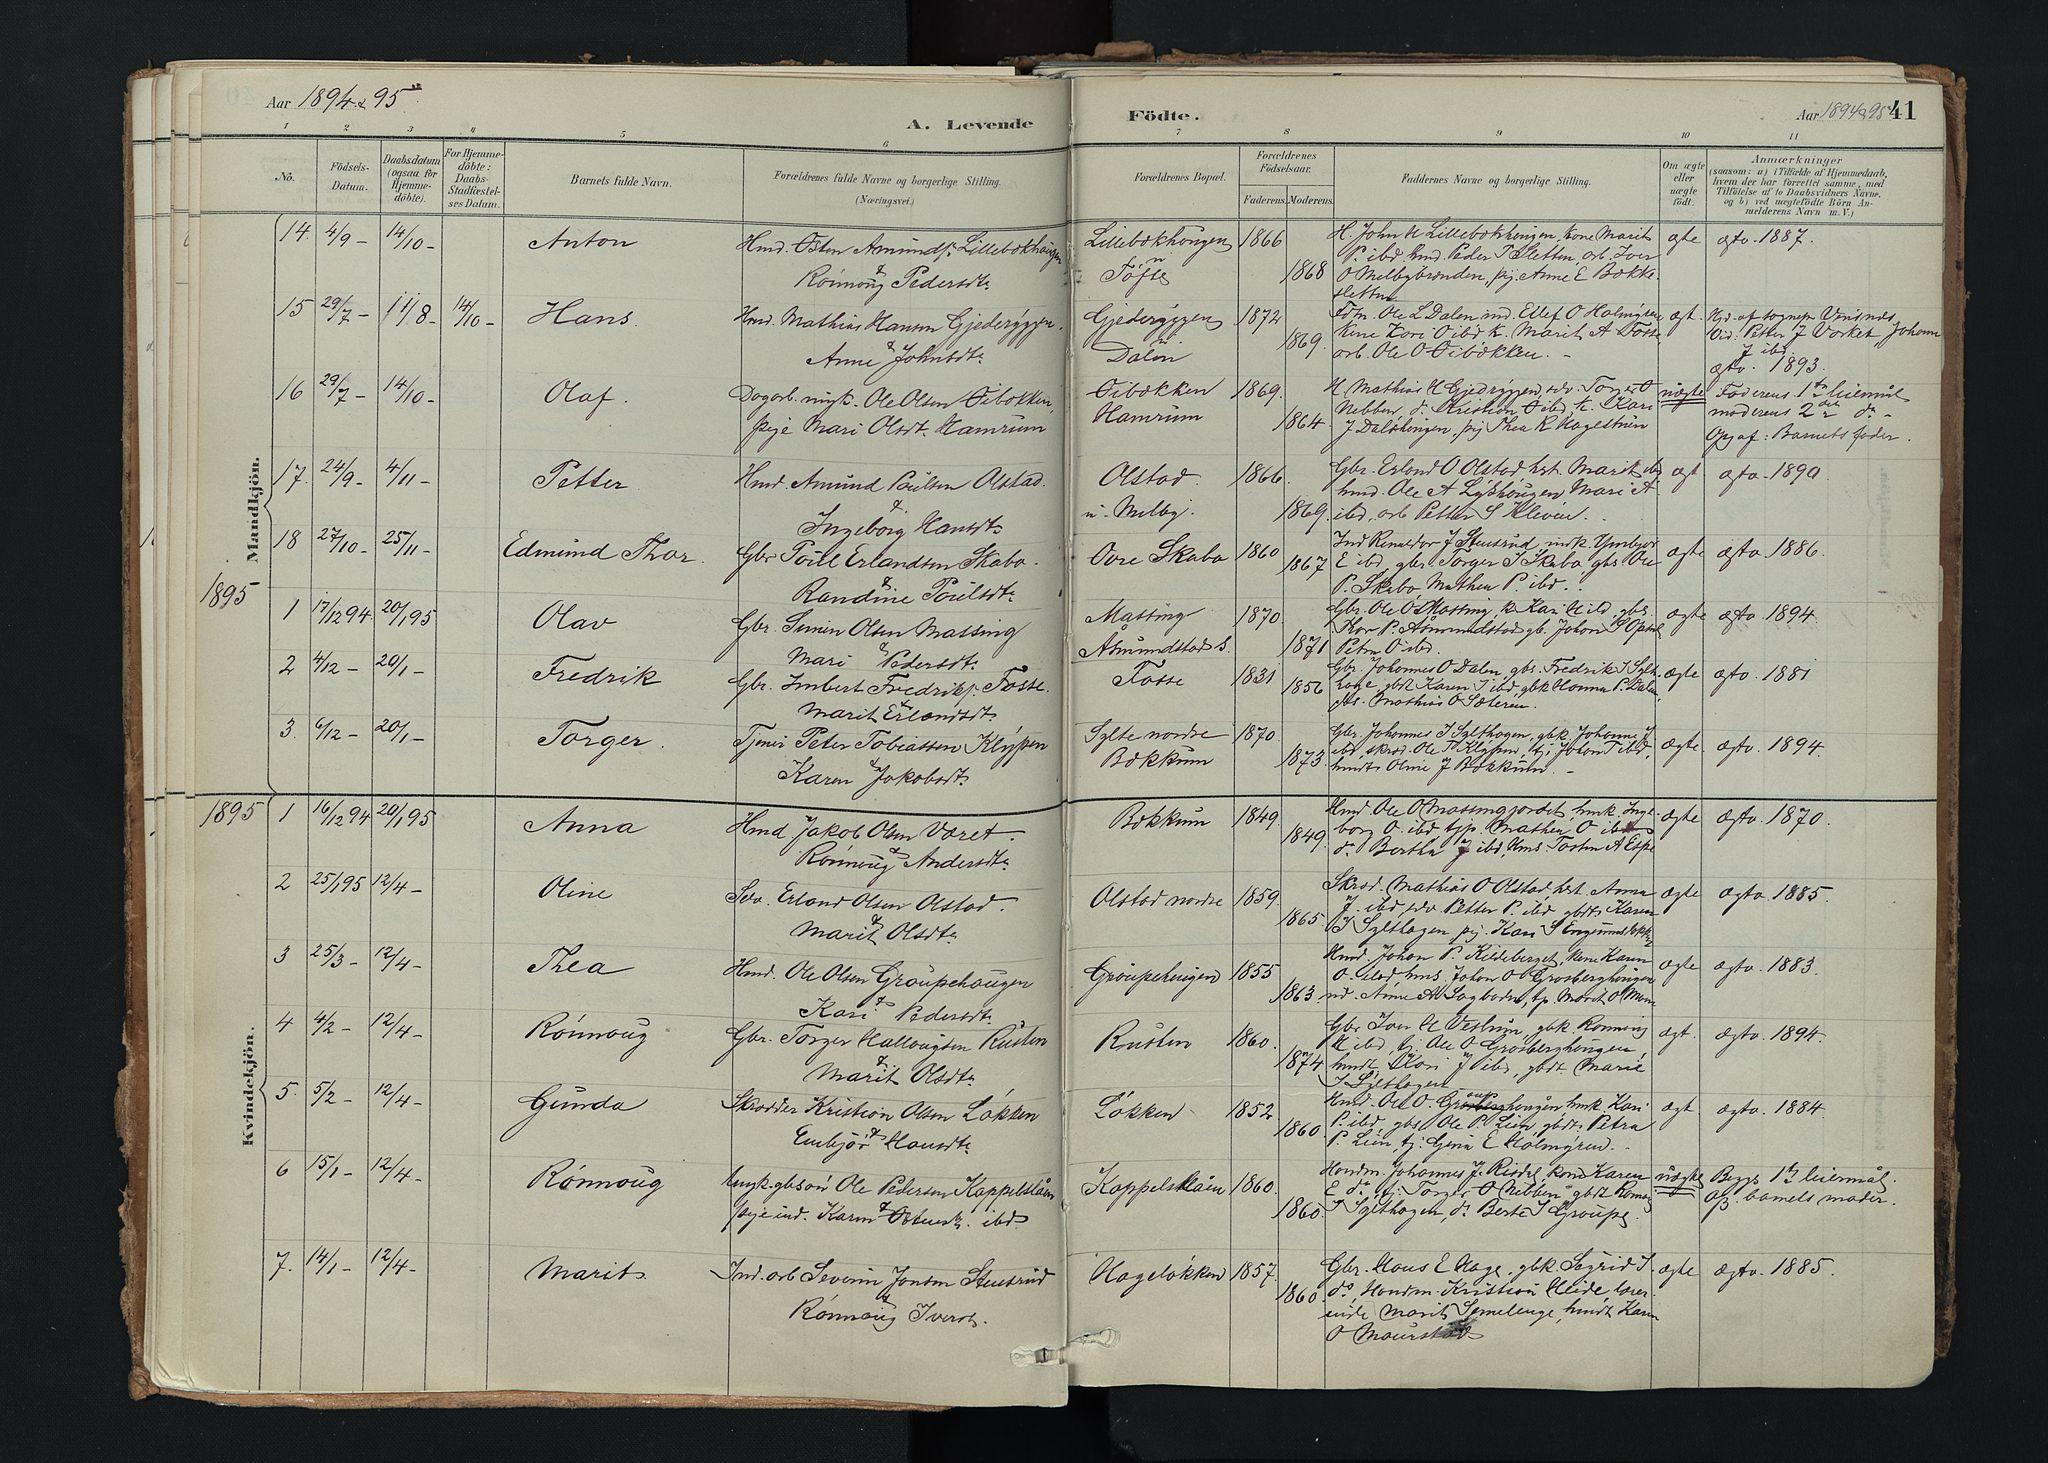 SAH, Nord-Fron prestekontor, Ministerialbok nr. 5, 1884-1914, s. 41